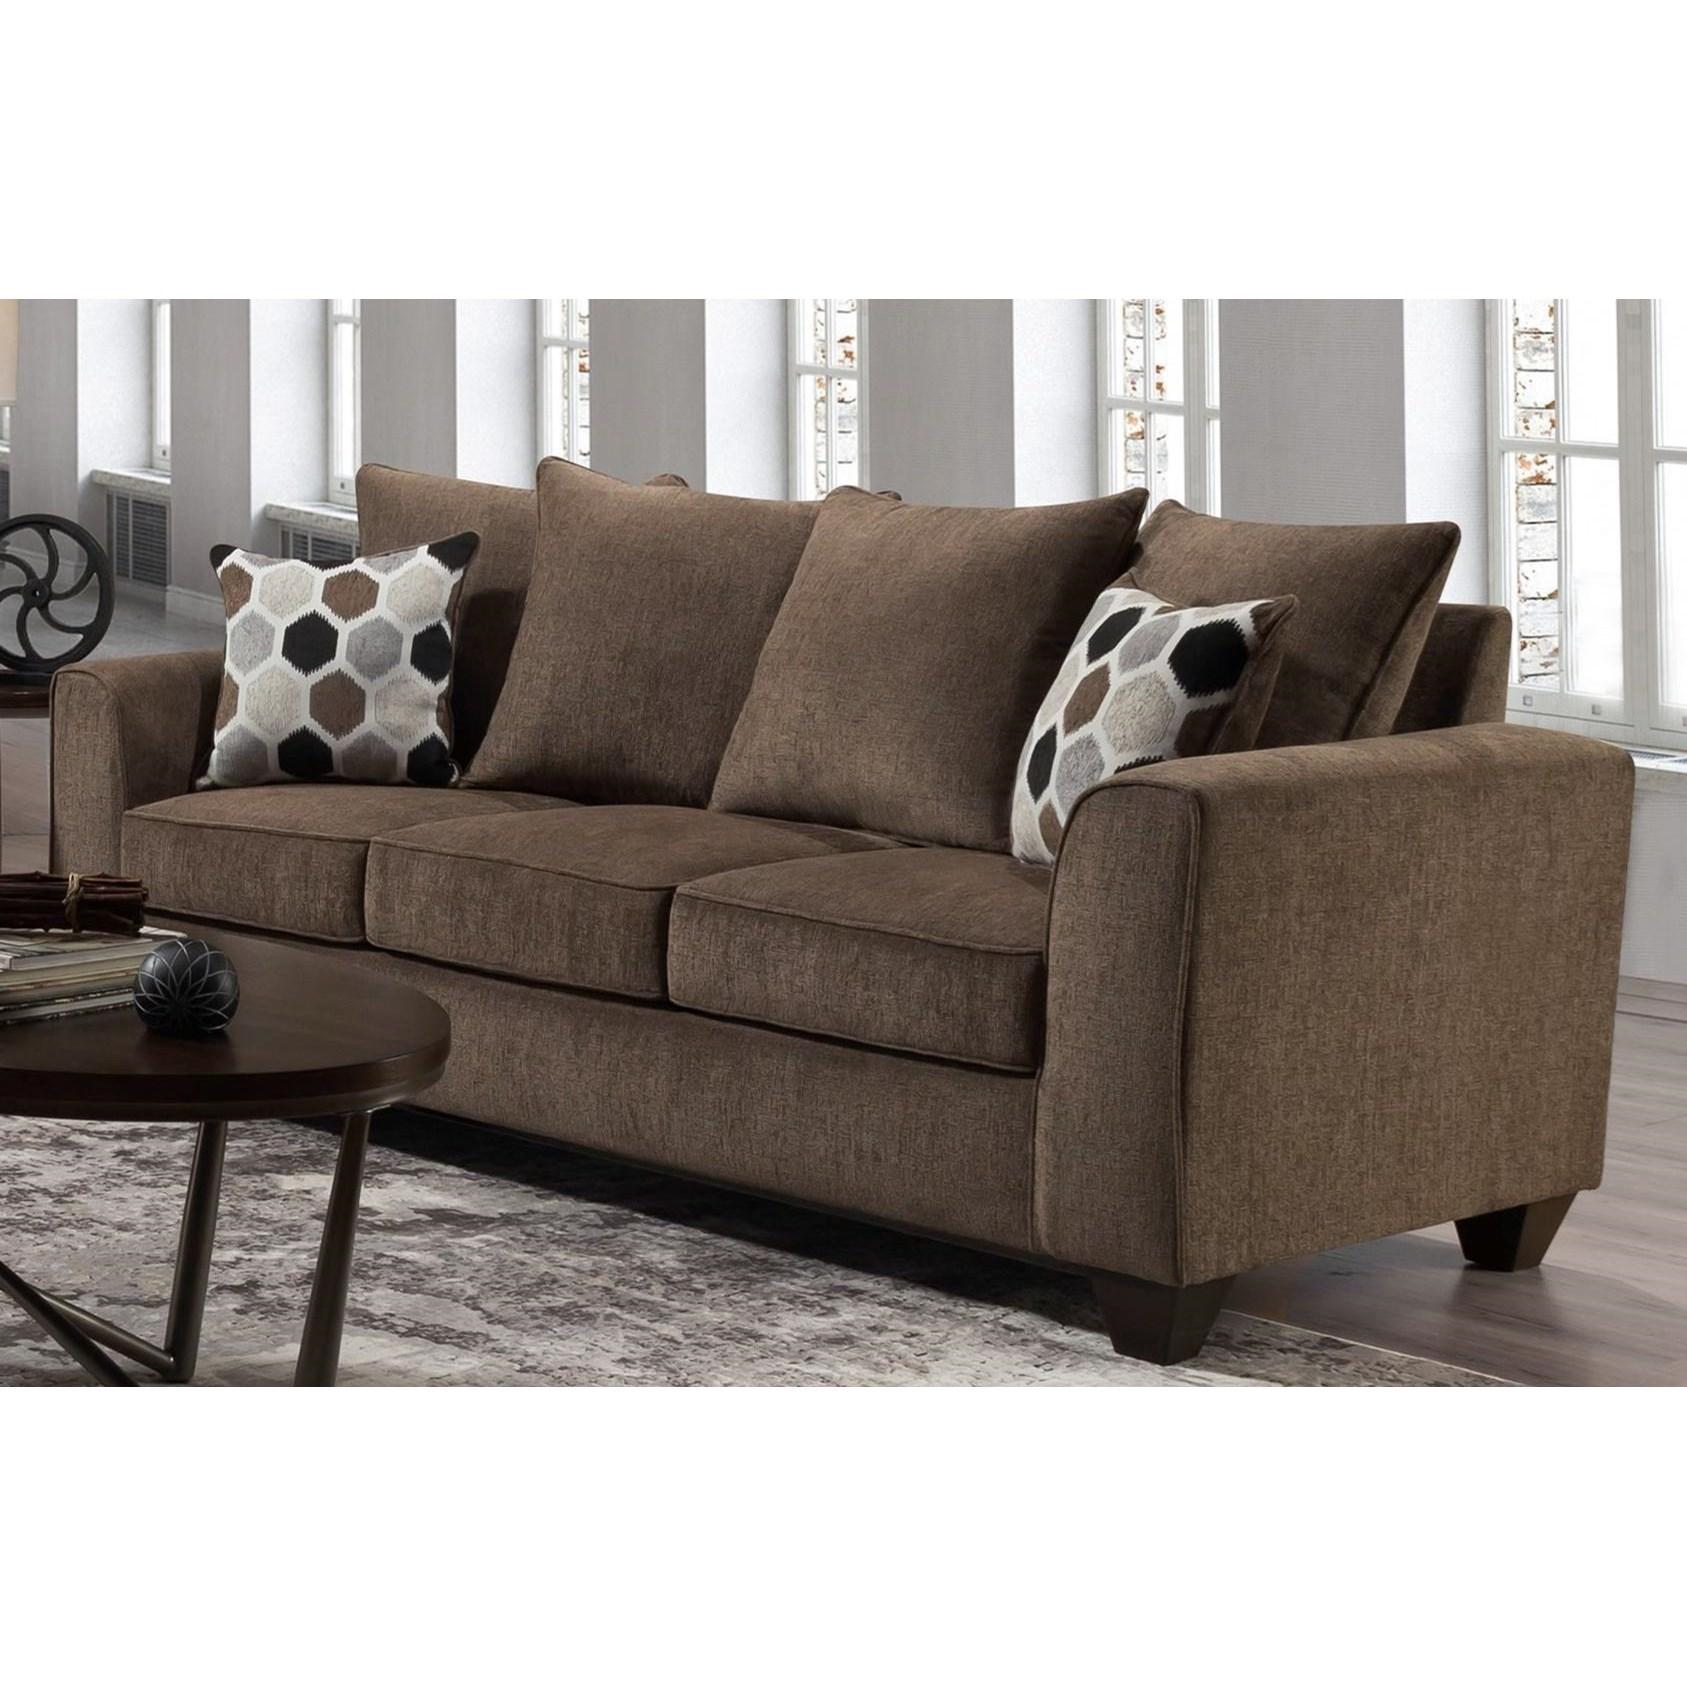 1220 Sofa by Peak Living at Prime Brothers Furniture